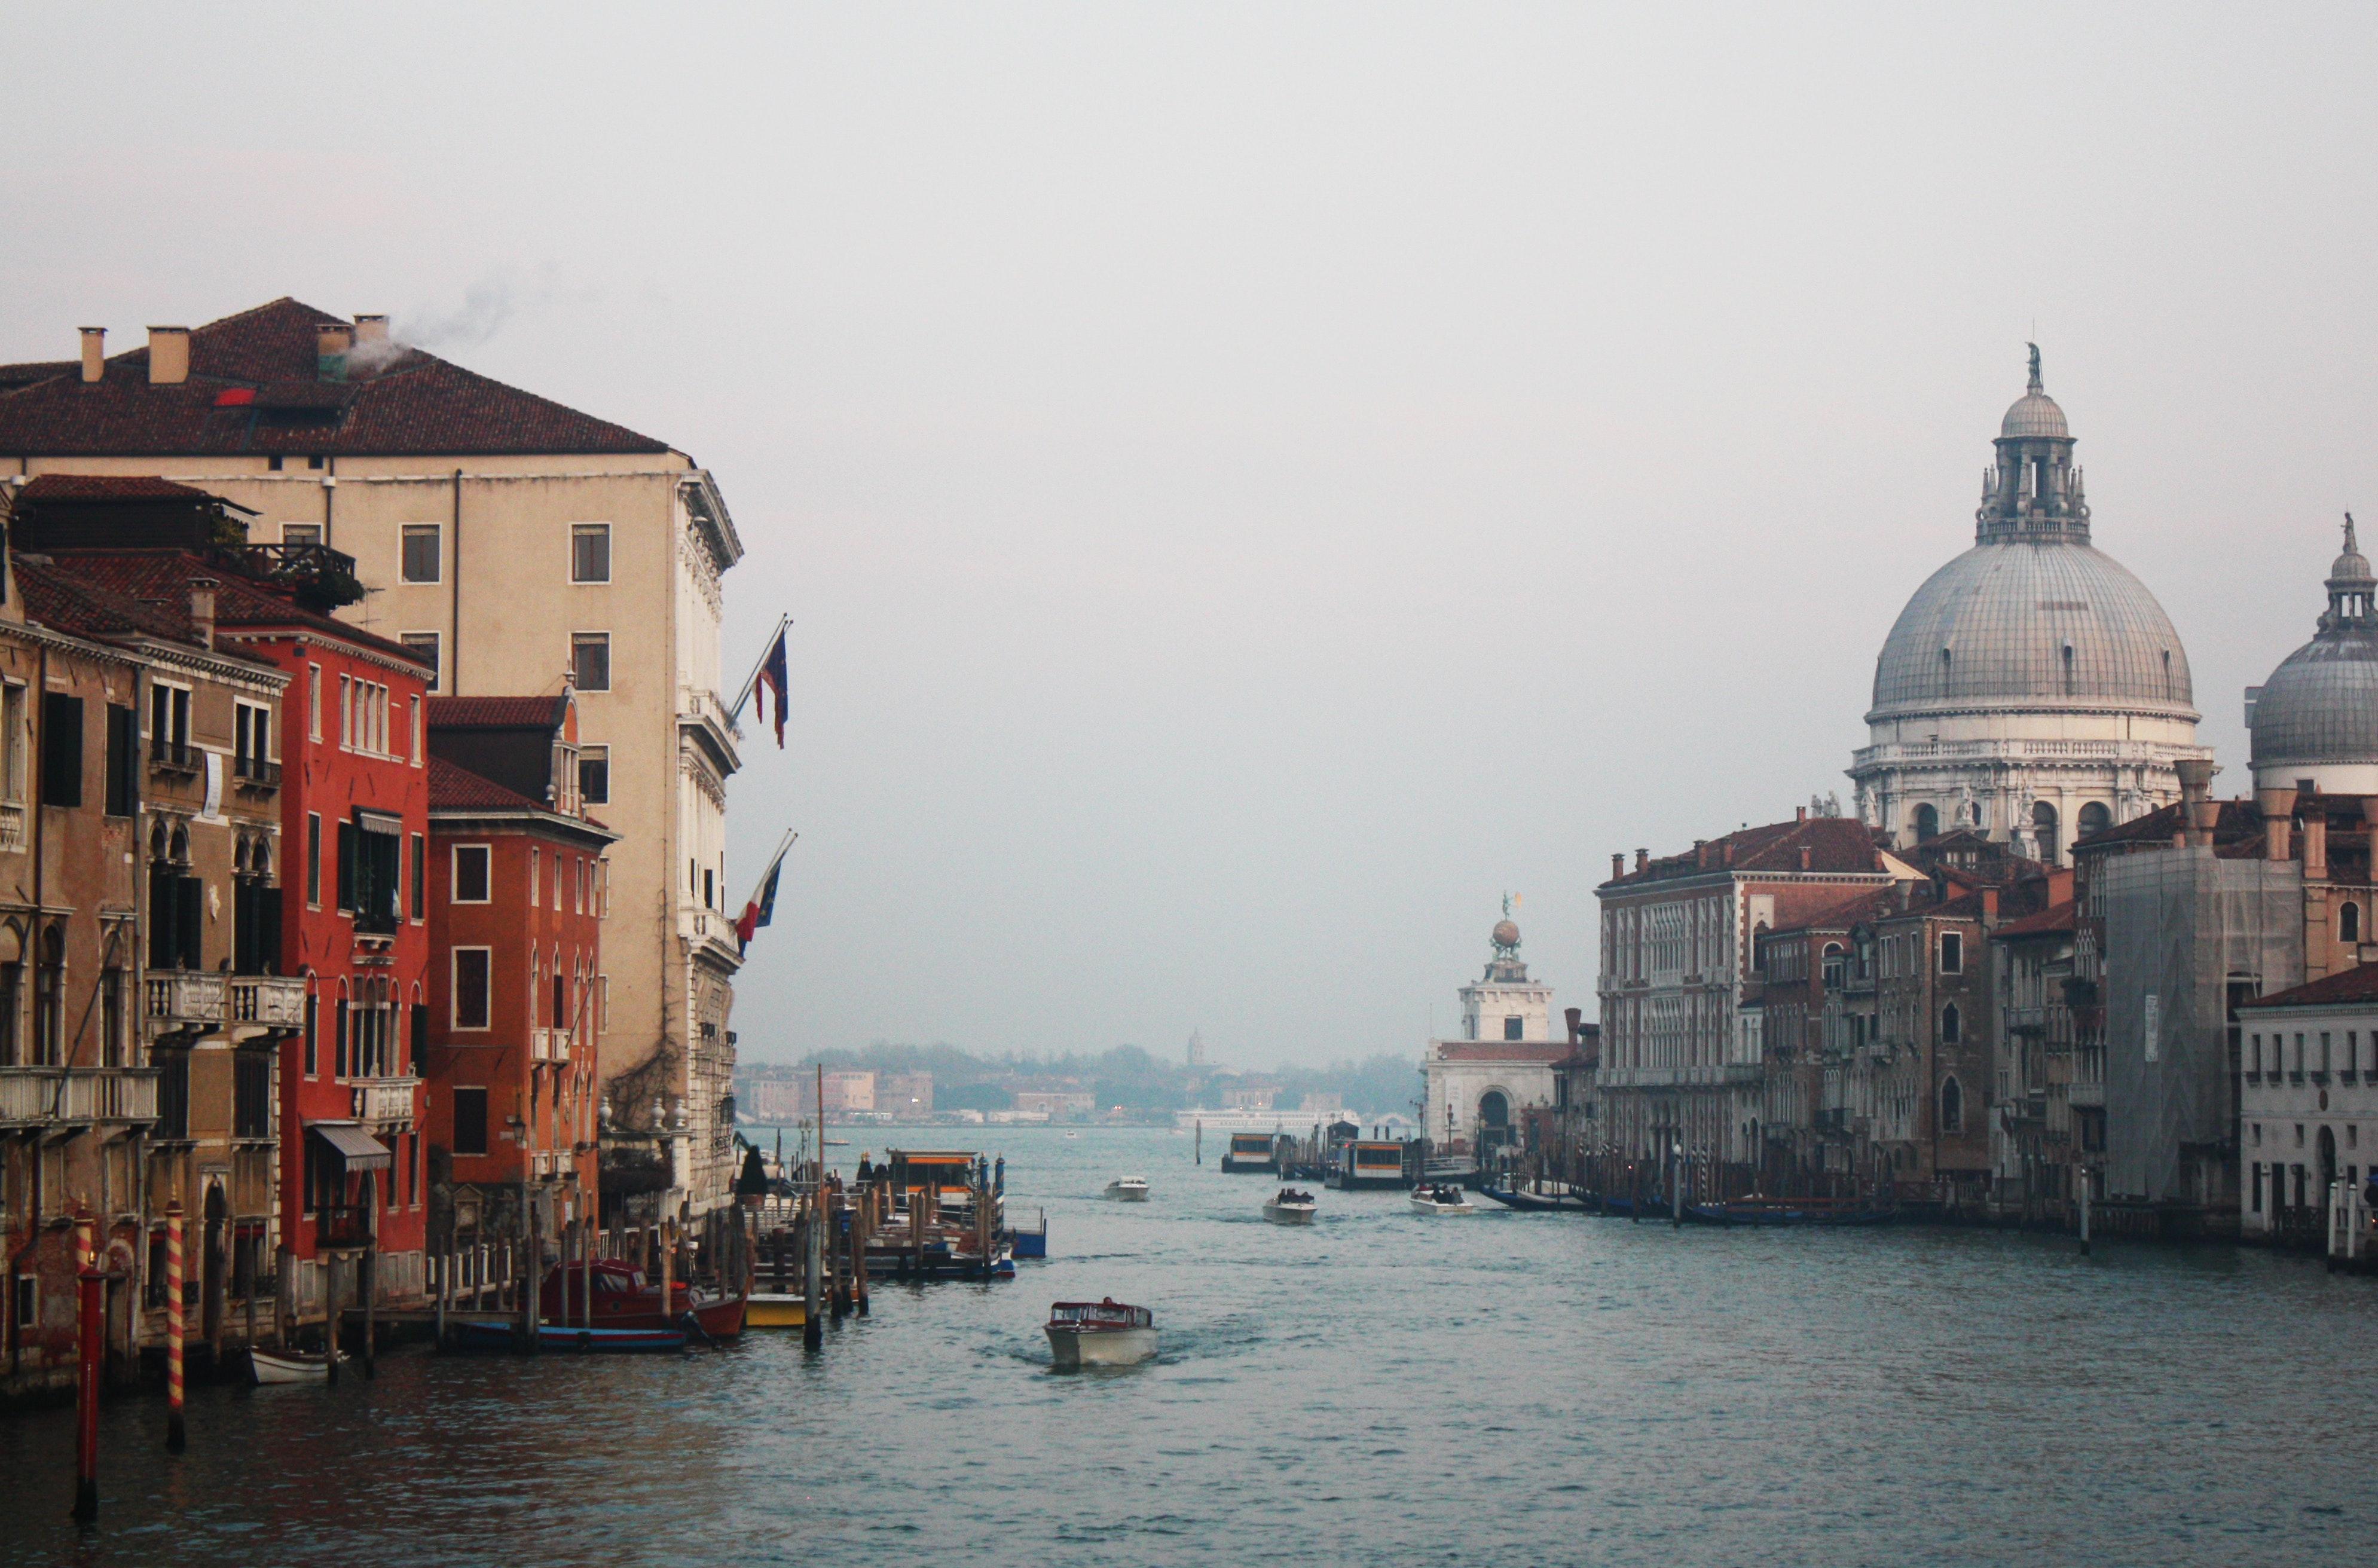 White motor boat on ocean beside concrete buildings photo